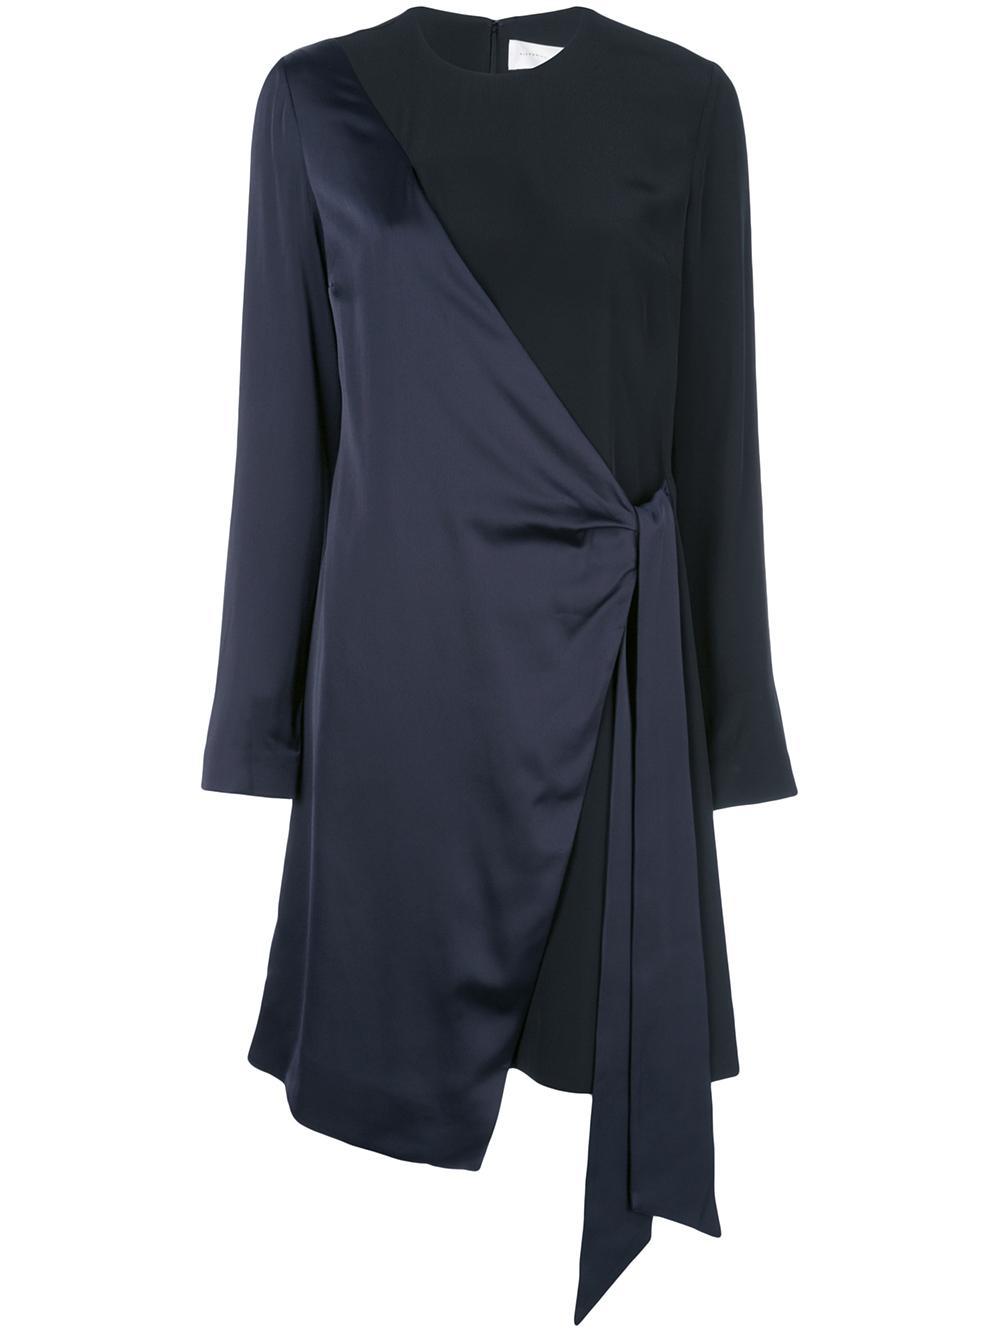 Long Sleeve Two Tone Satin Crepe Wrap Dress Item # DRVV694-PAW19